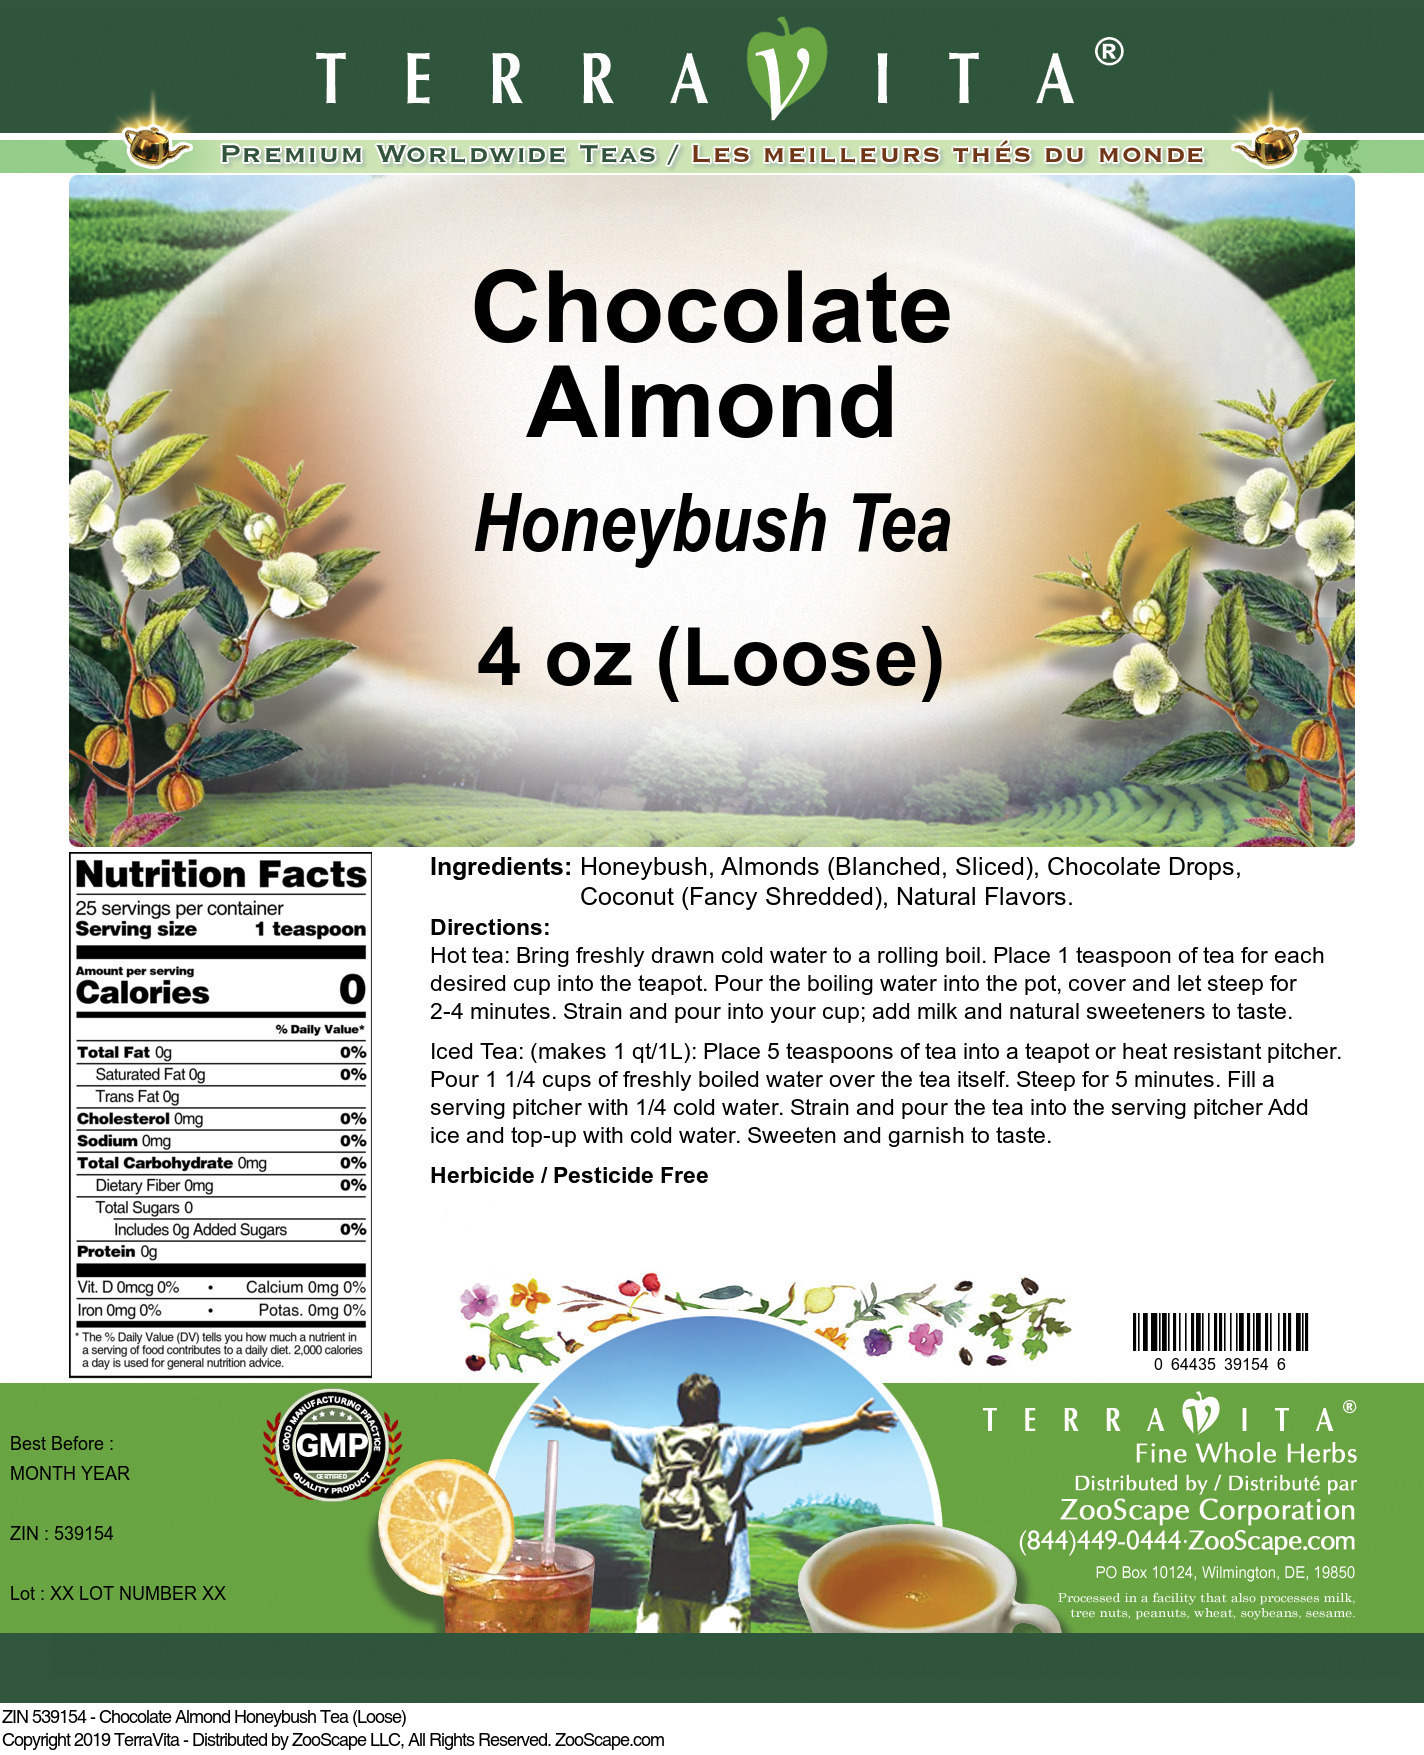 Chocolate Almond Honeybush Tea (Loose)